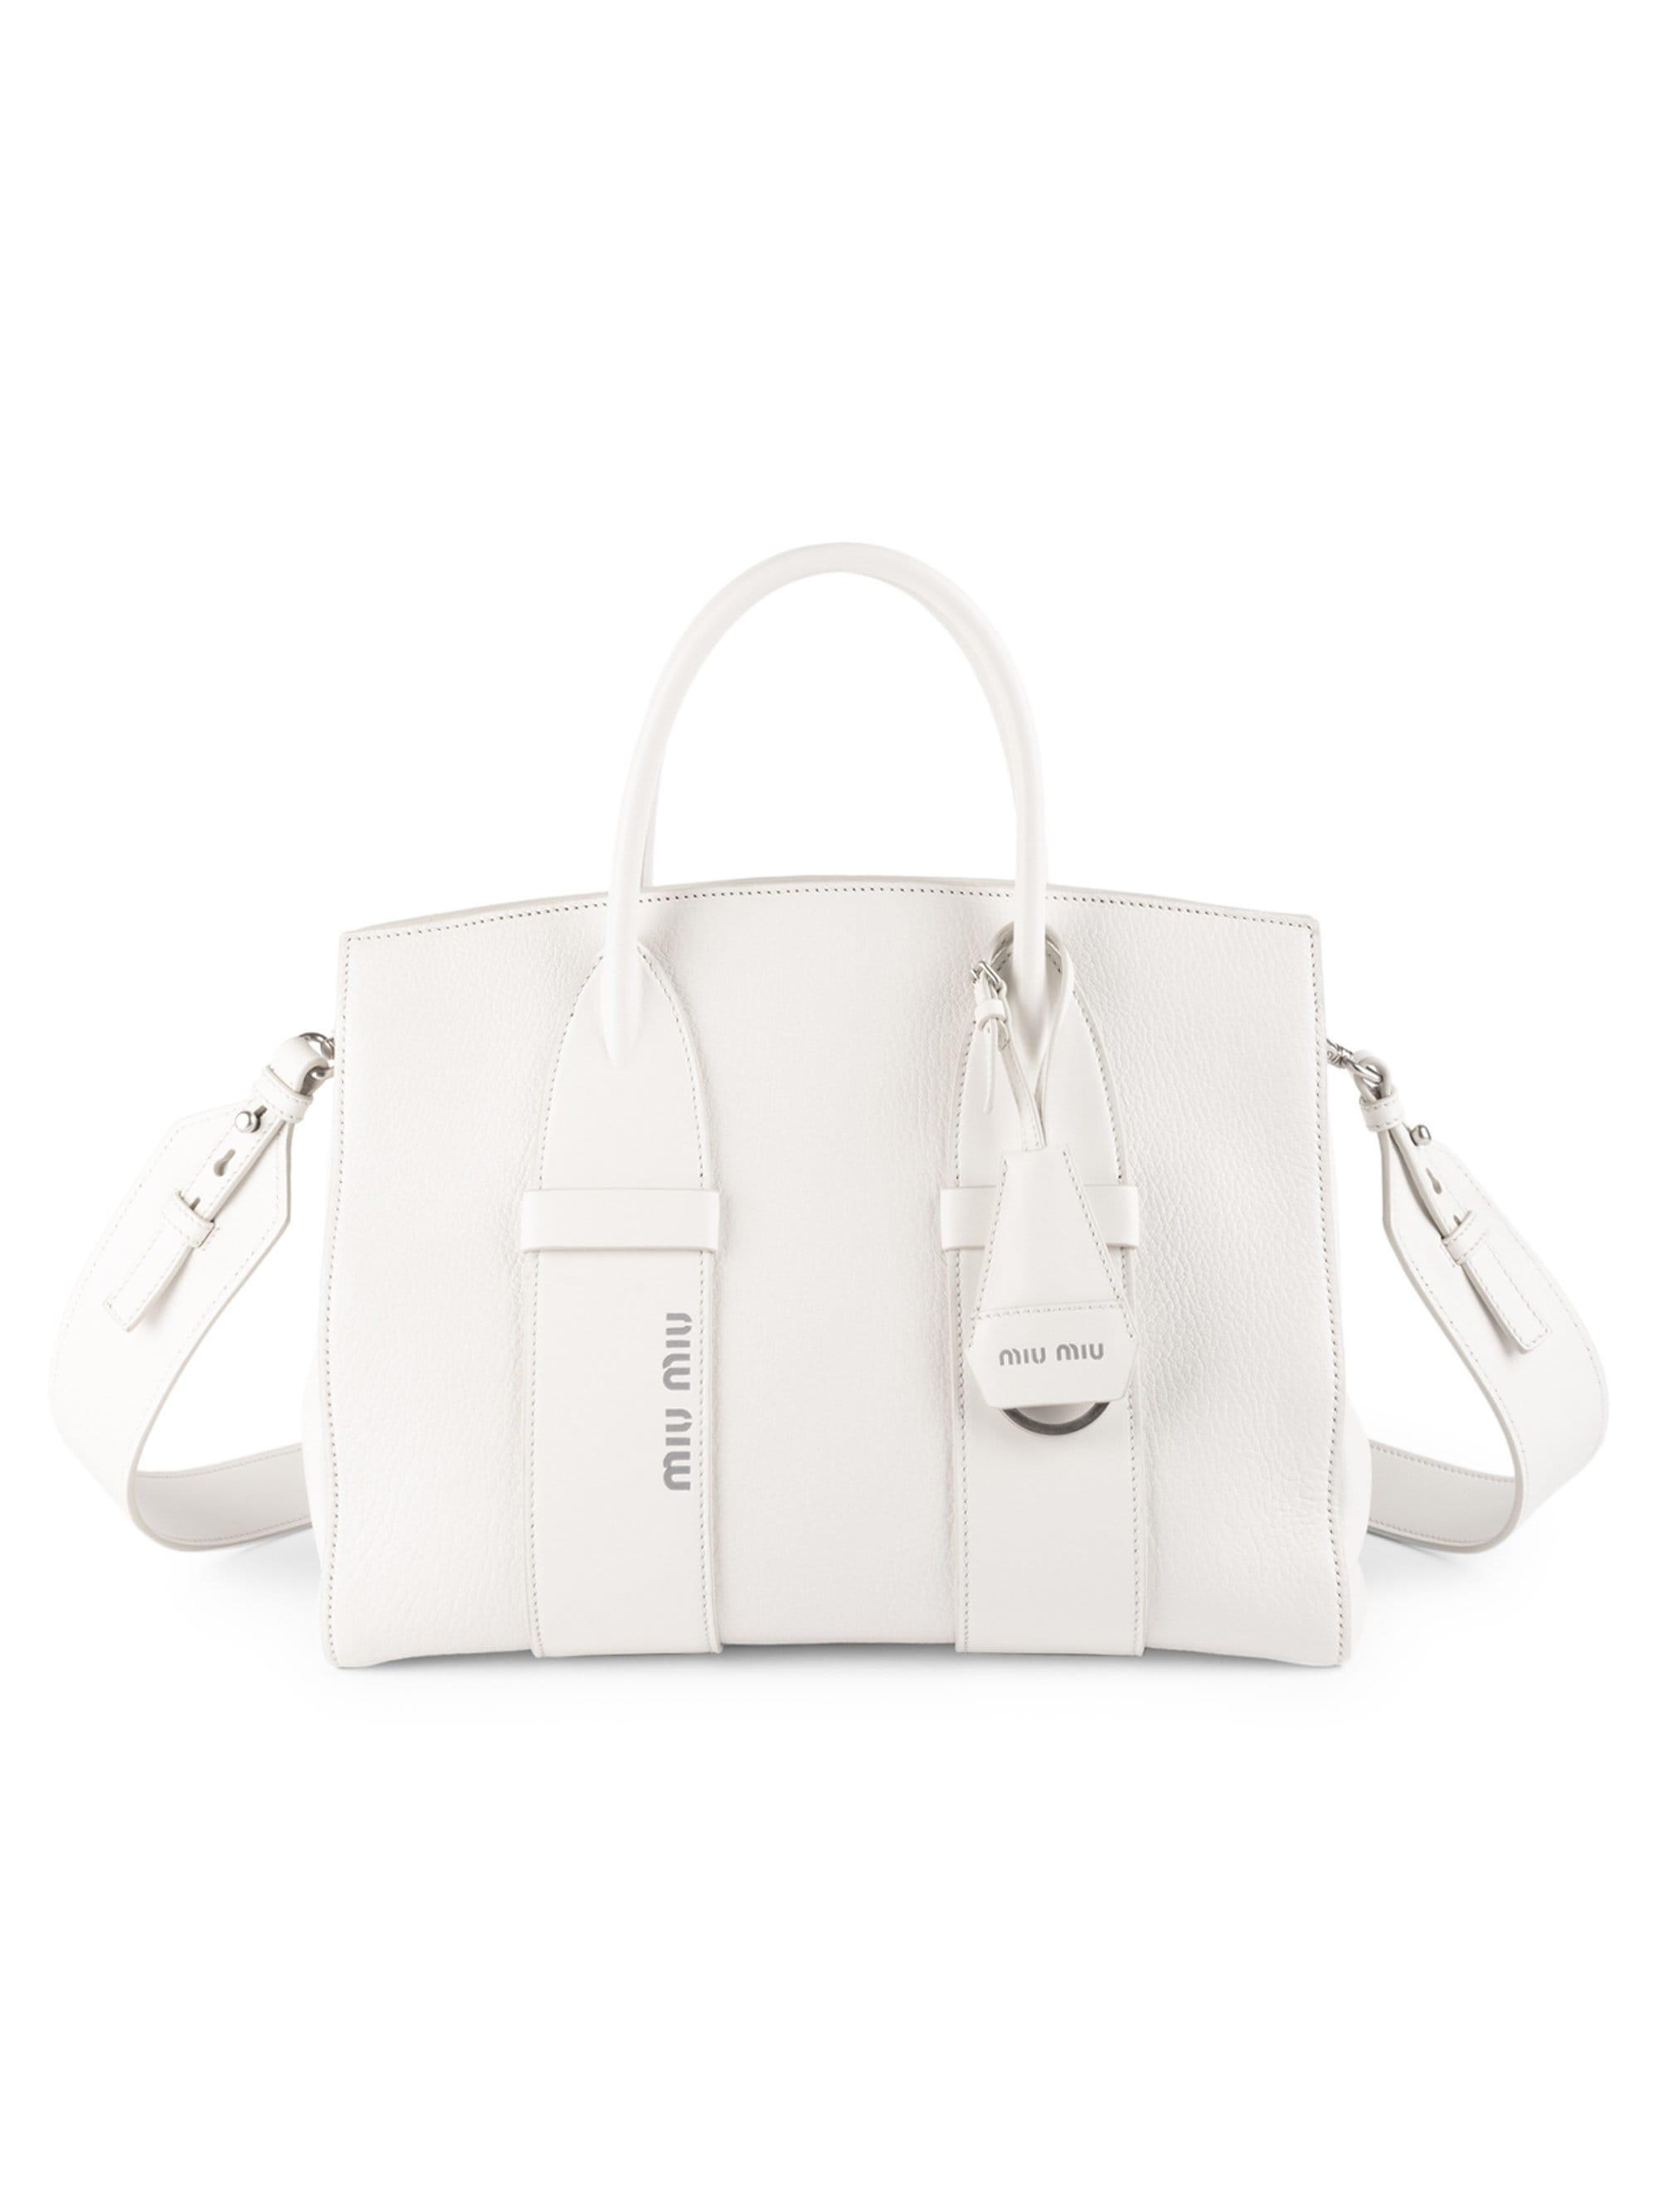 2f39c8657960 Lyst - Miu Miu Women s Small Madras Leather Satchel - White in White